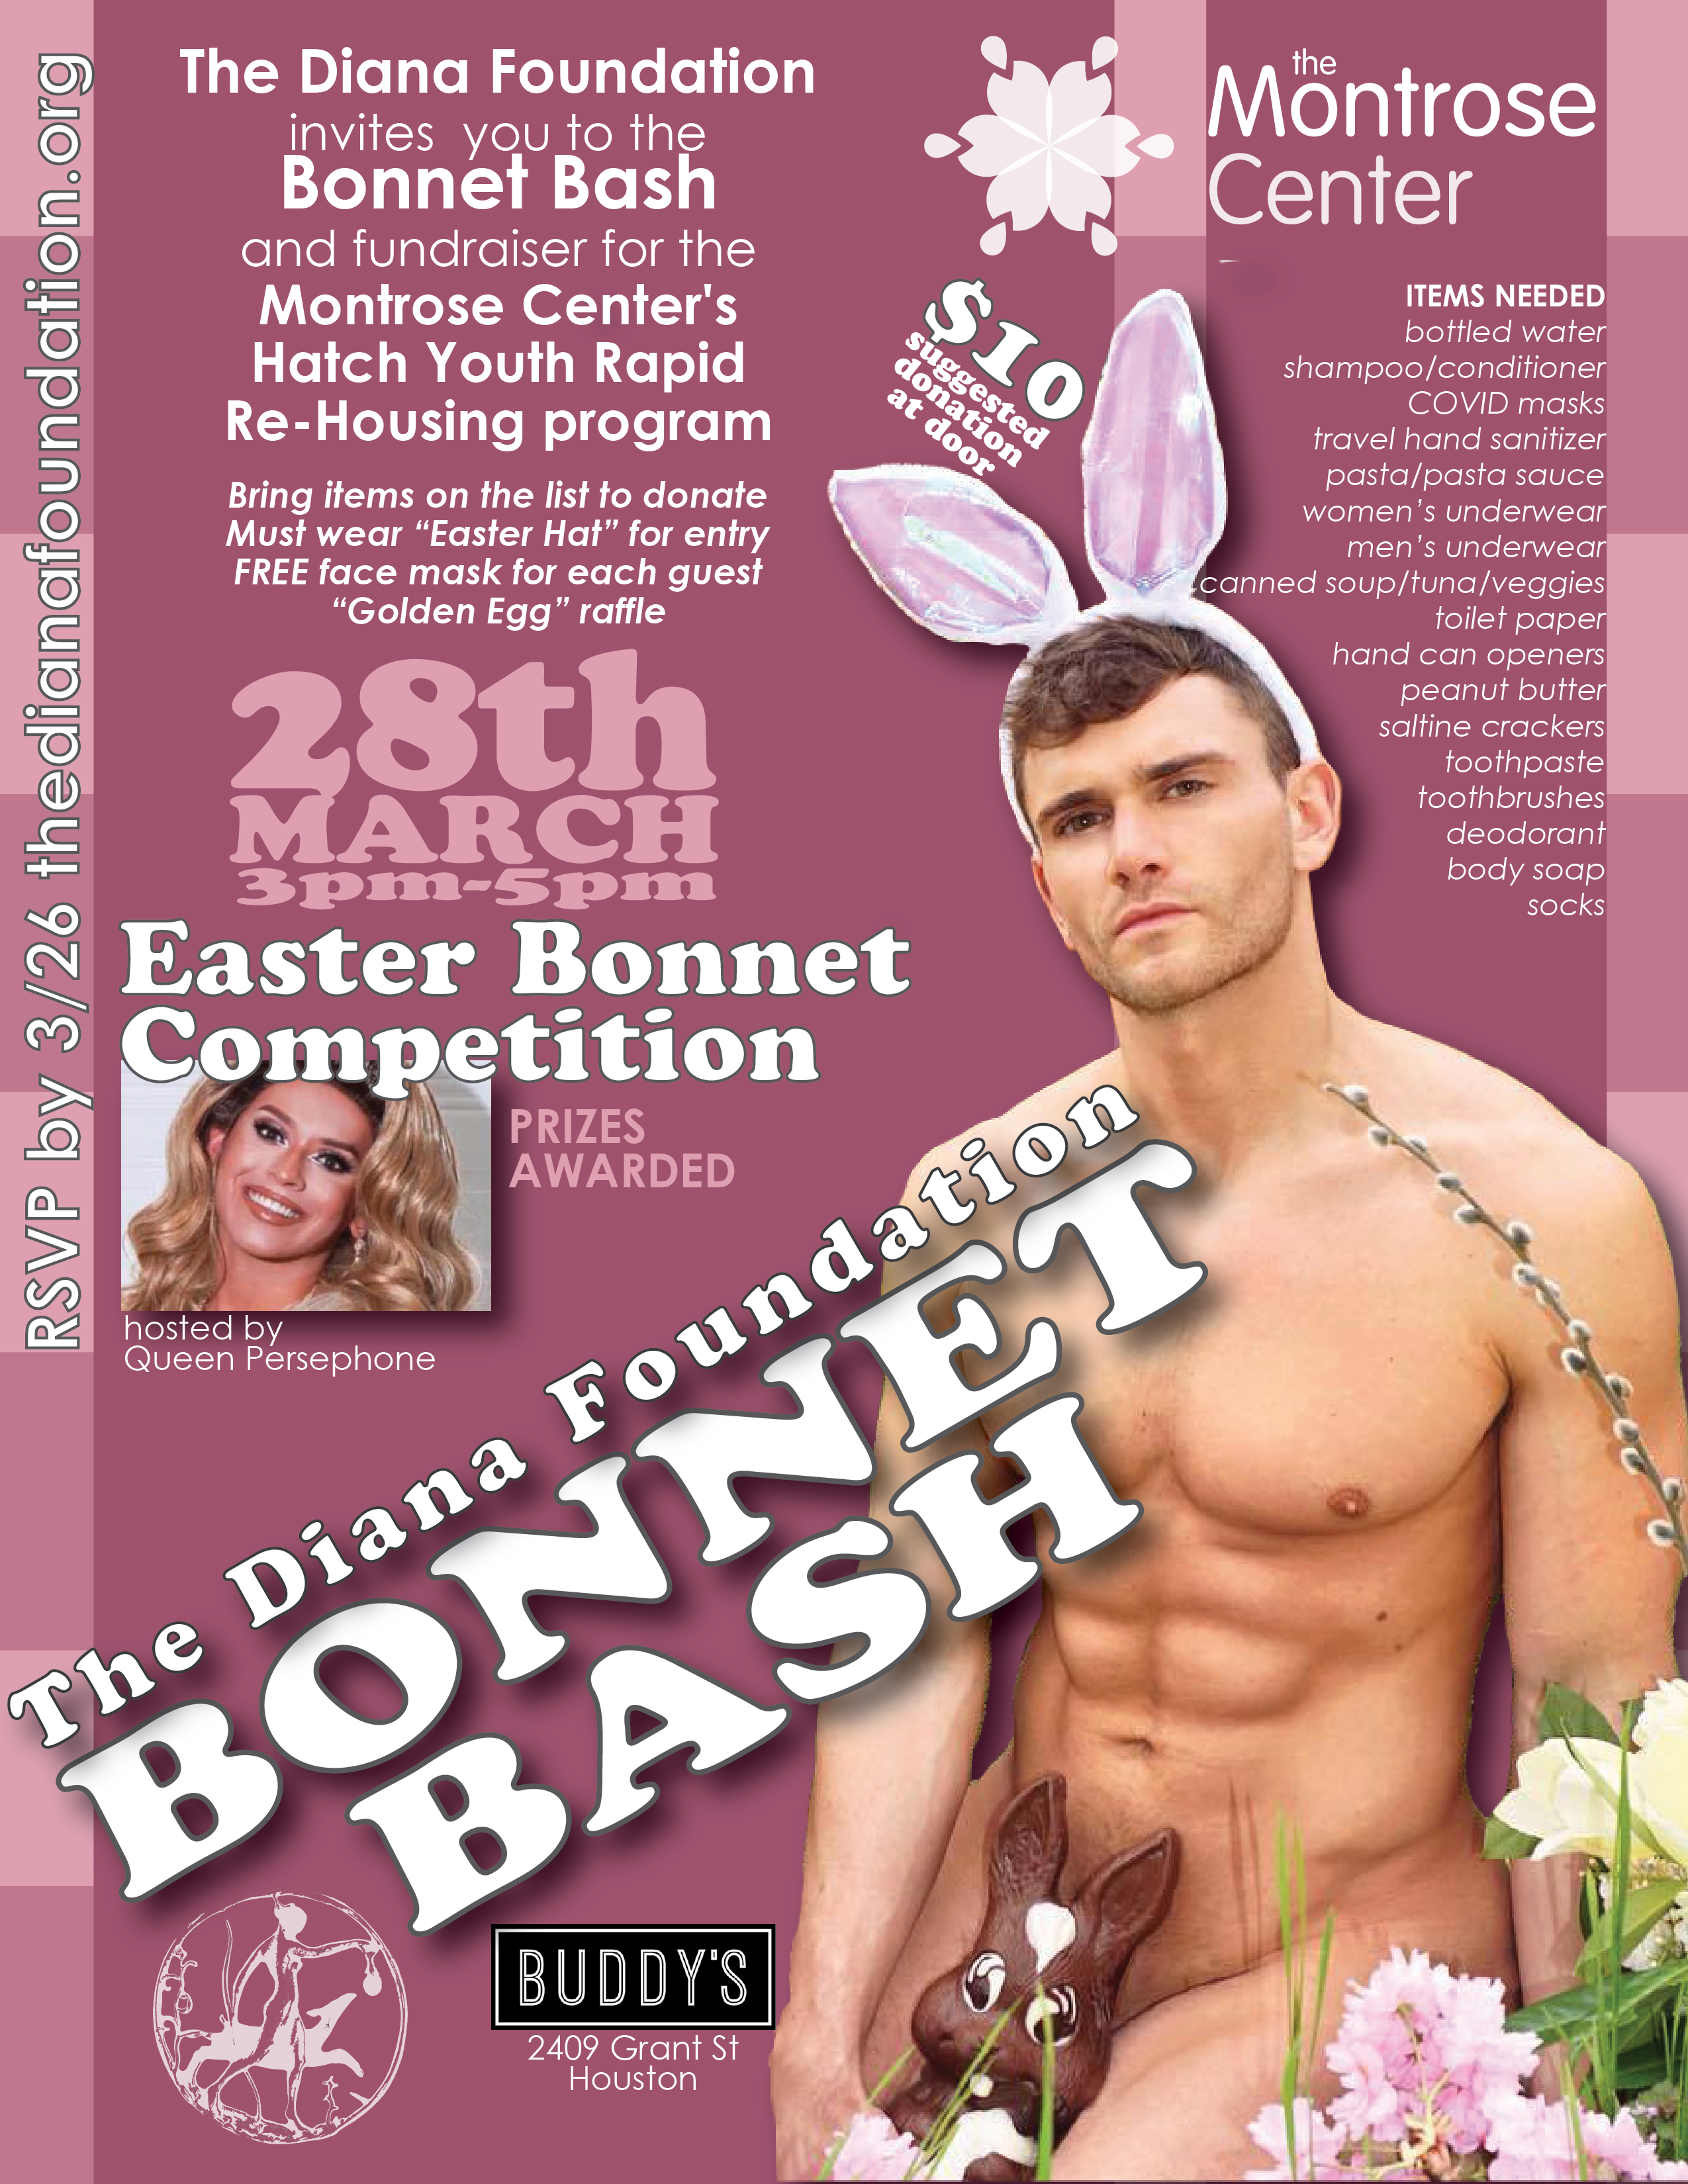 Diana Bonney Bash